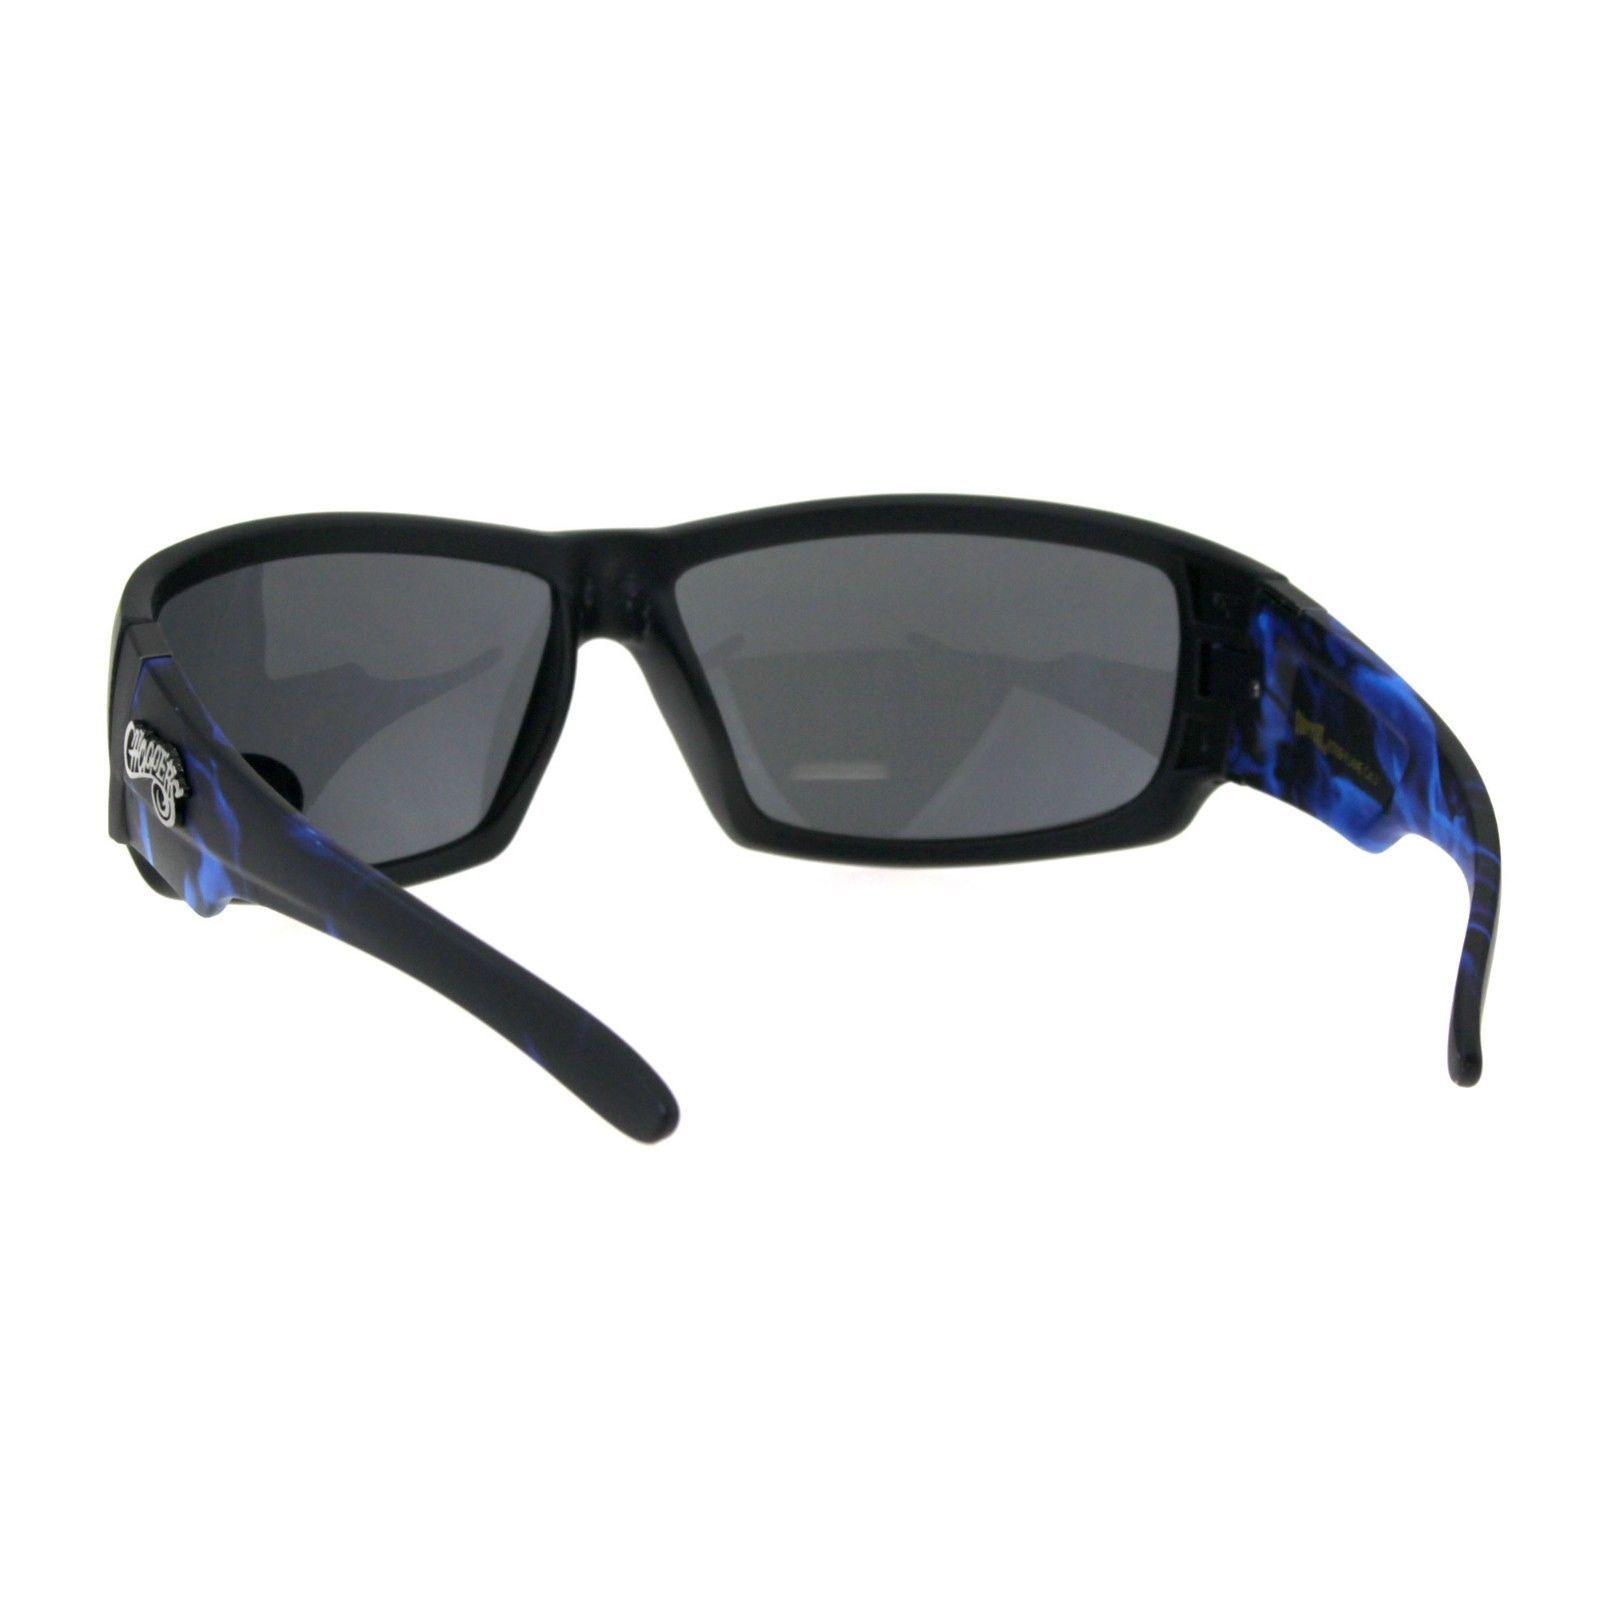 dbbfc9300086 Choppers Sunglasses Mens Biker Fashion Rectangular Flame Design